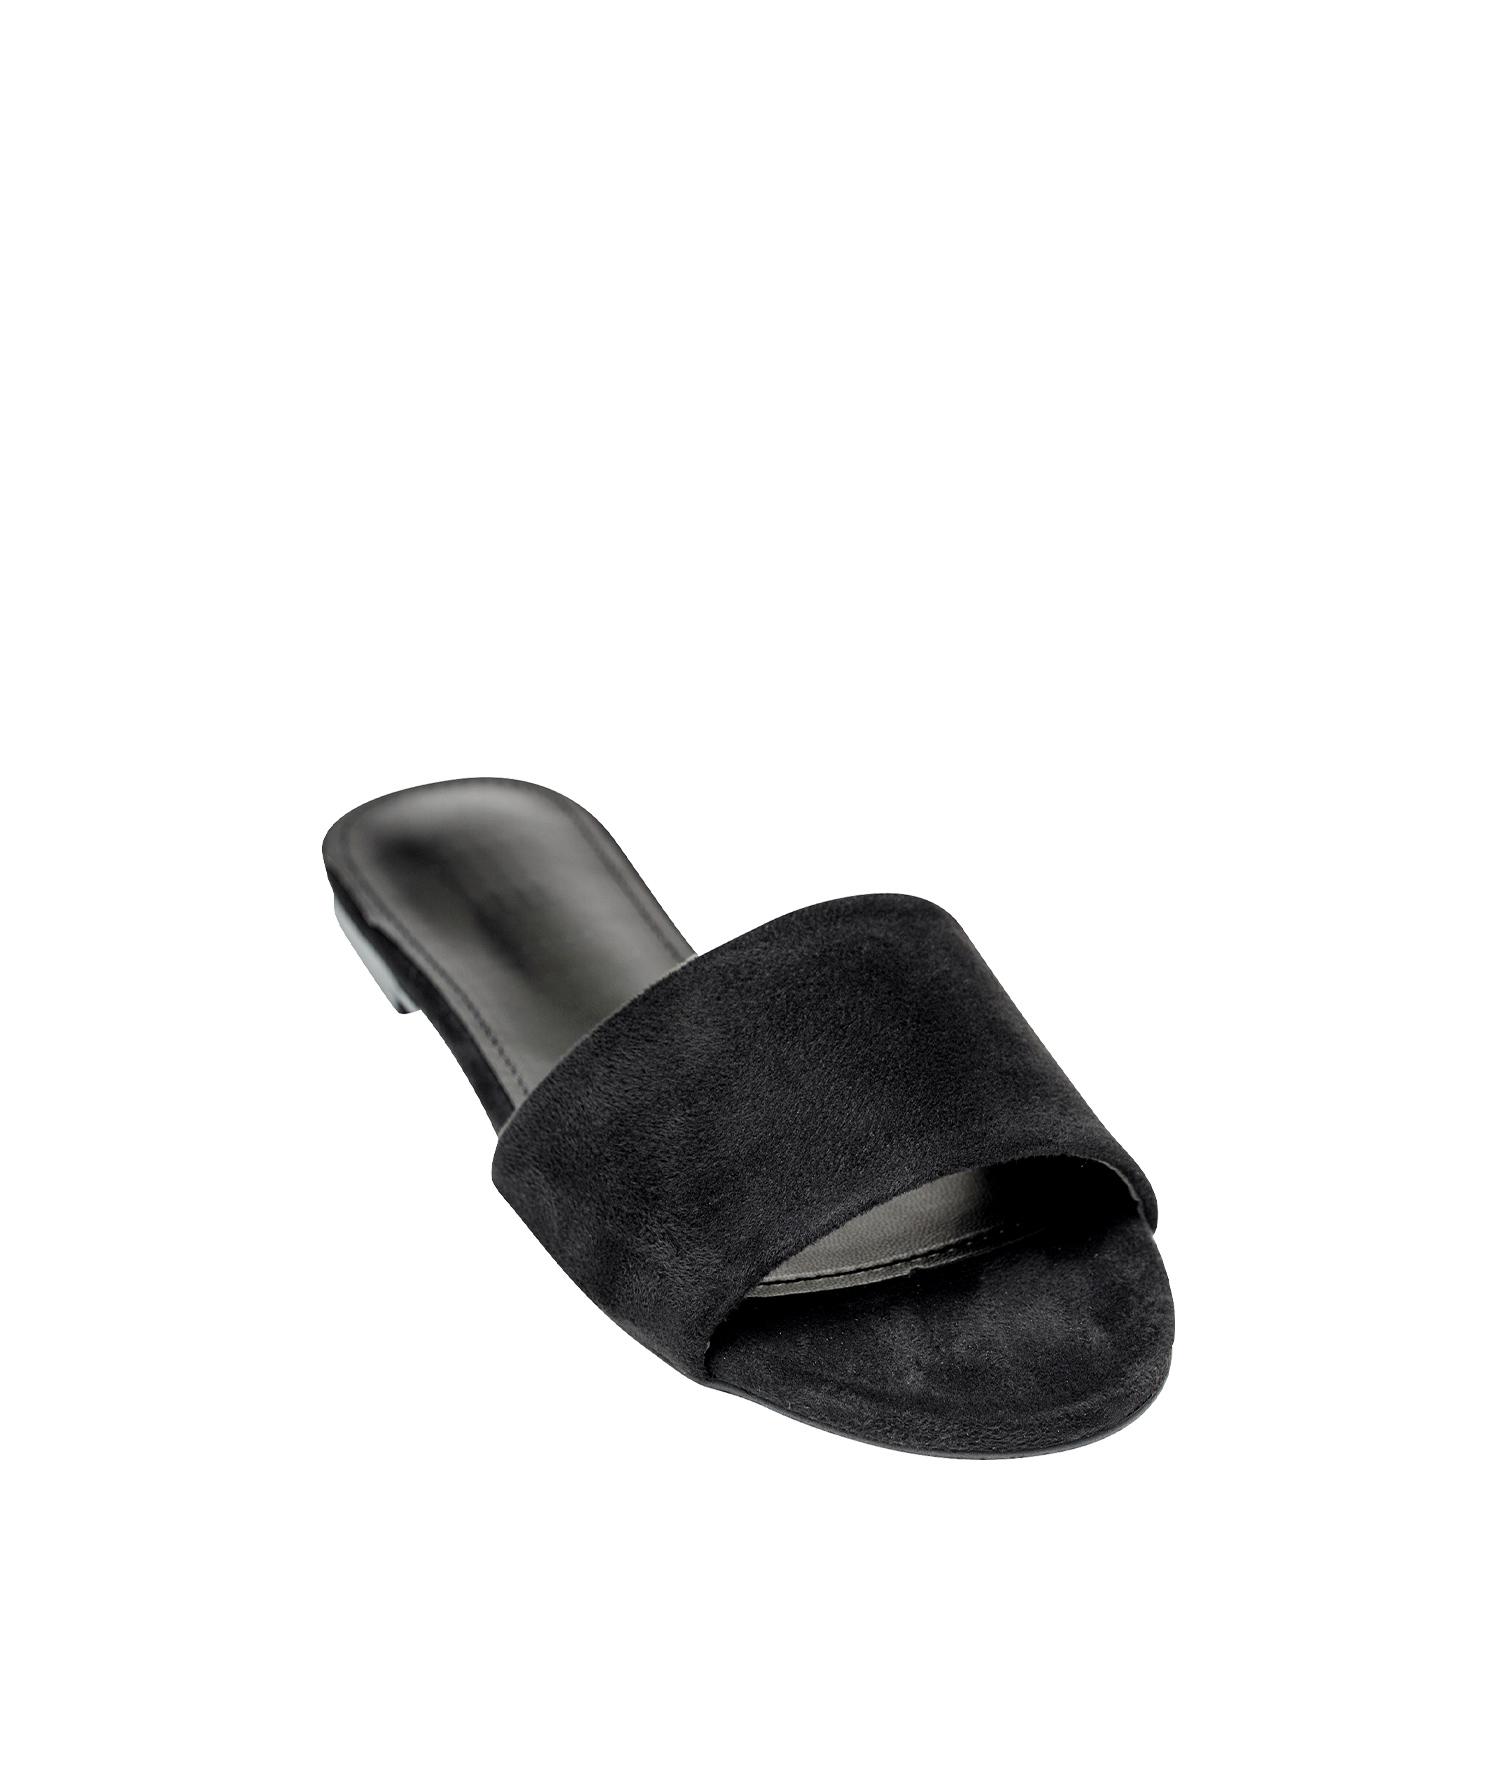 63a7f67c69a AnnaKastle Womens Vegan Suede Single Strap Slide Sandals Black